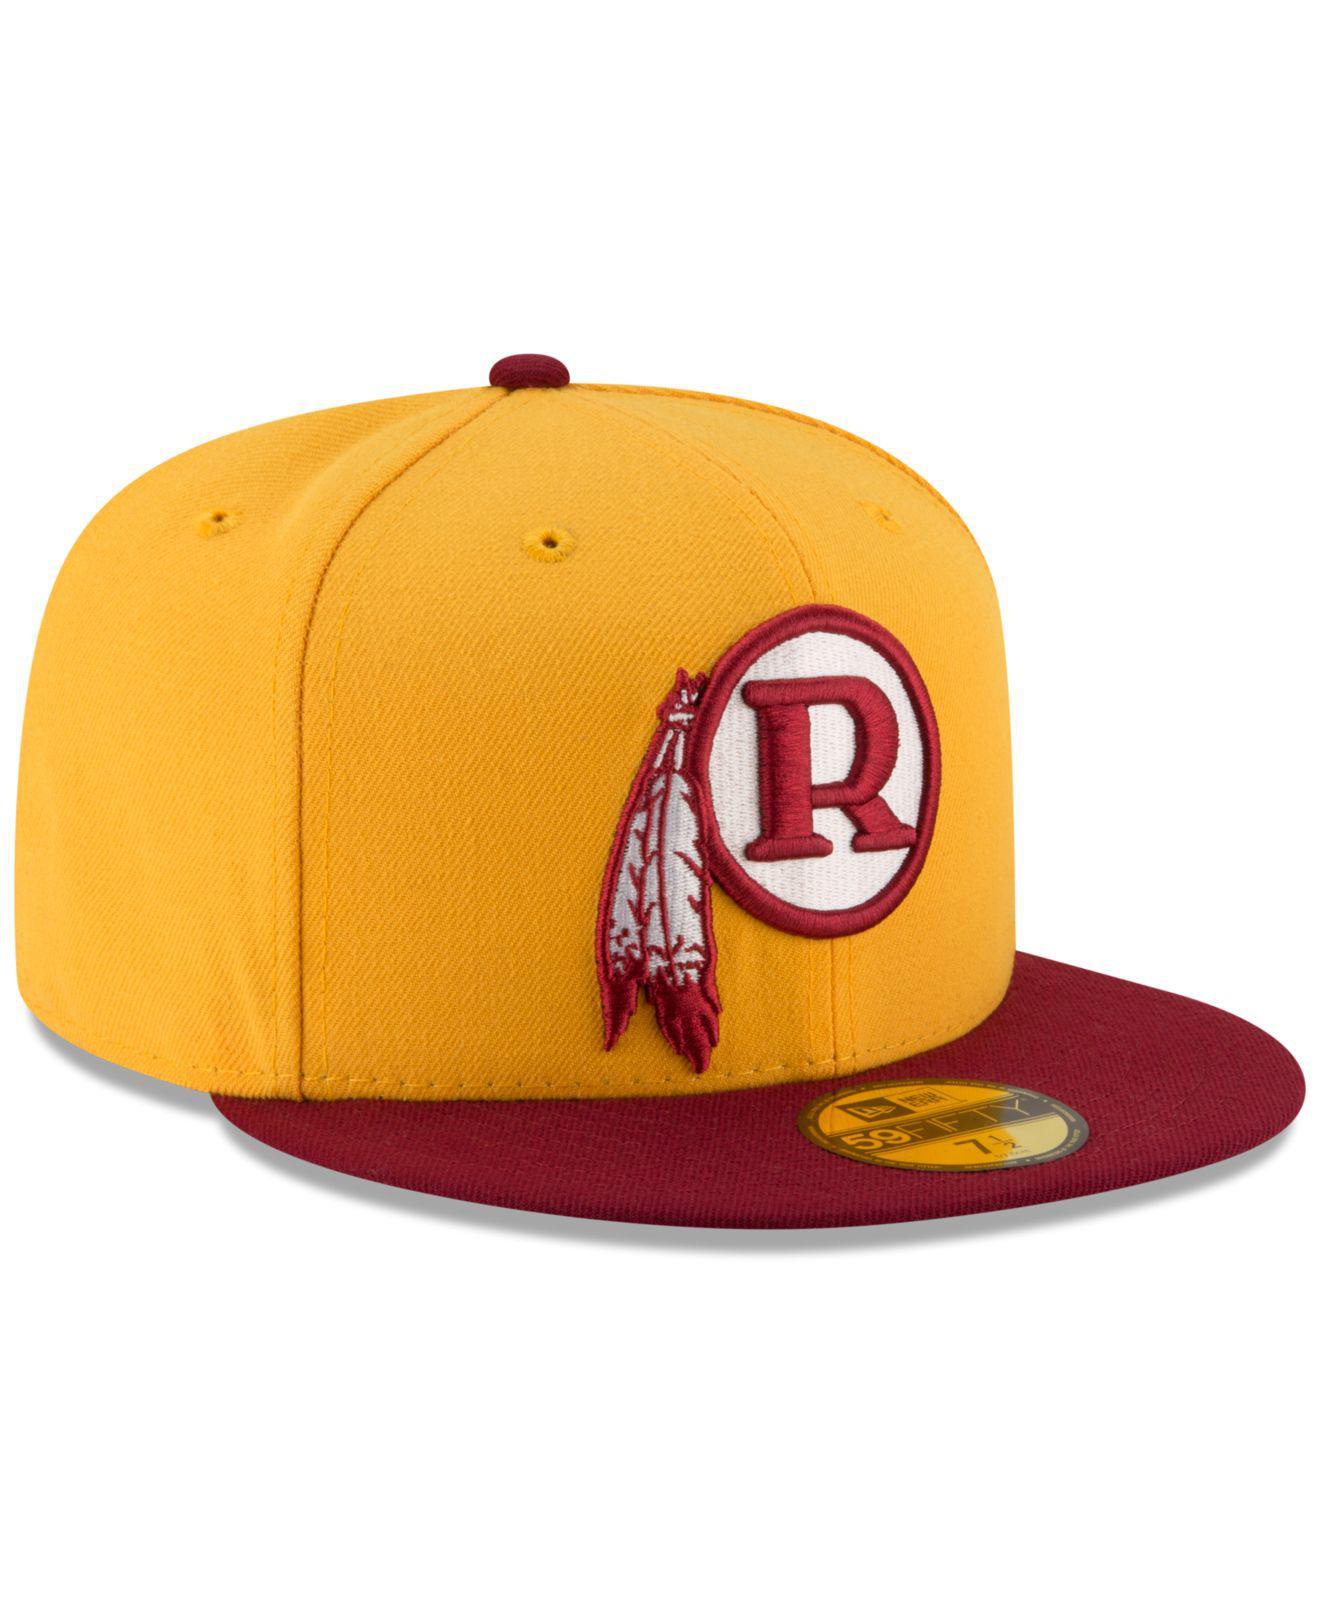 super popular 0aef2 20fd9 Lyst - KTZ Washington Redskins Team Basic 59fifty Fitted Cap for Men